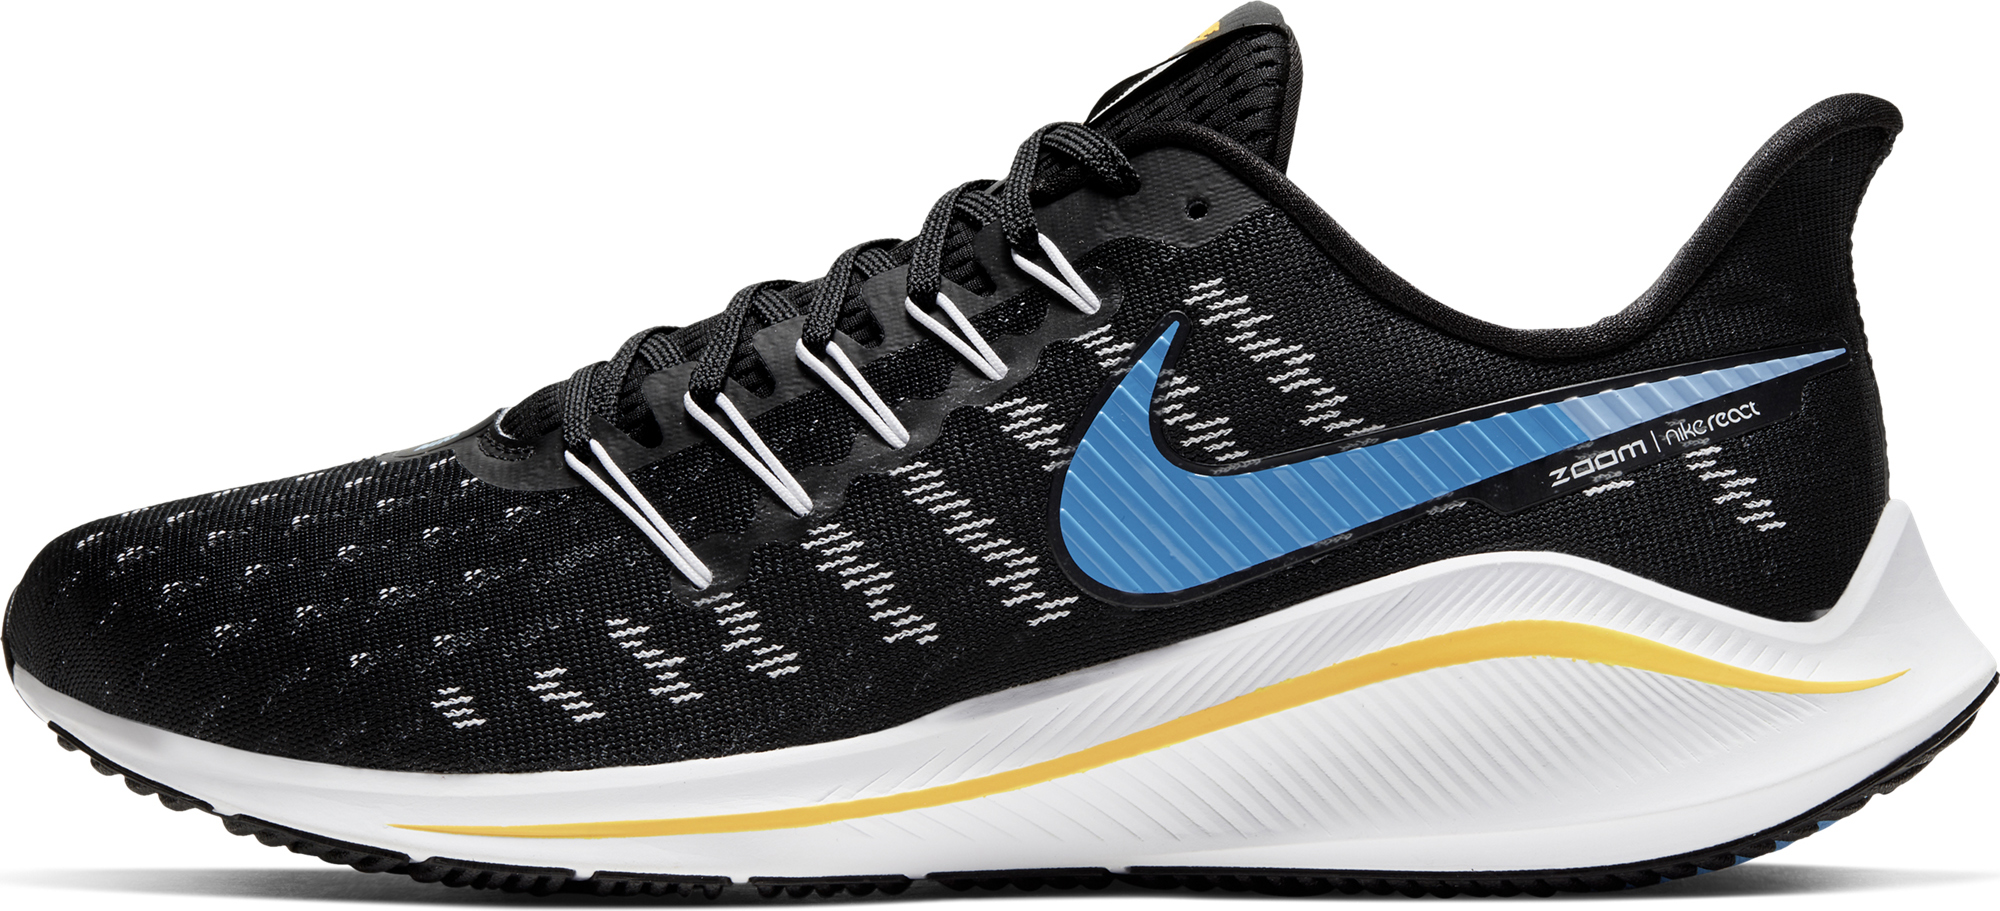 Nike Кроссовки мужские Air Zoom Vomero 14, размер 46,5